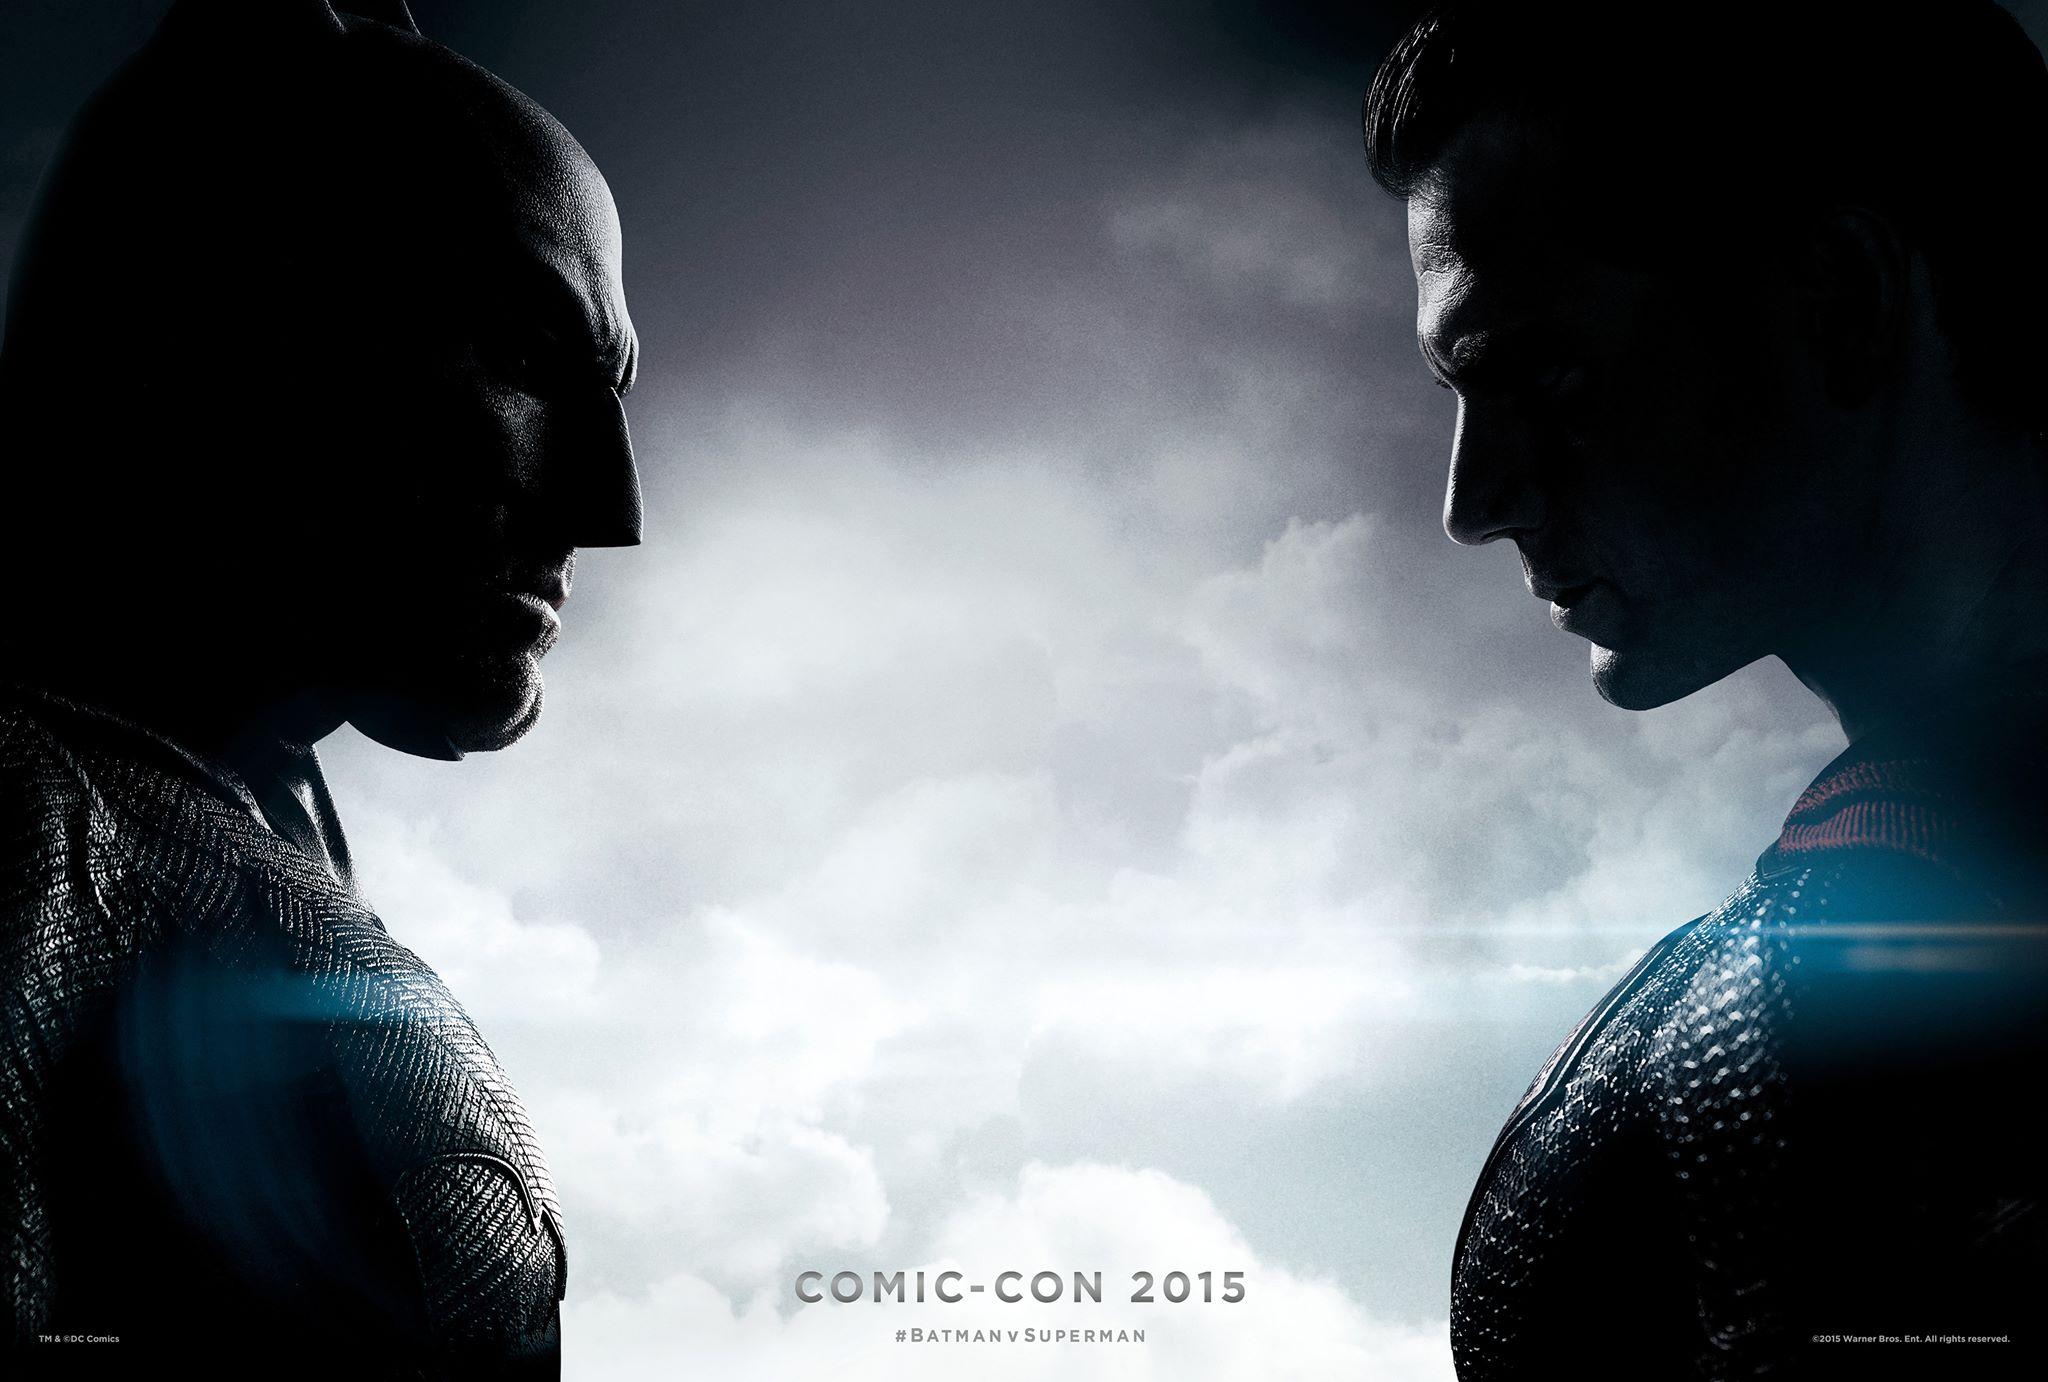 Batman-V-Superman-Dawn-of-Justice-3D-banner-comic-con